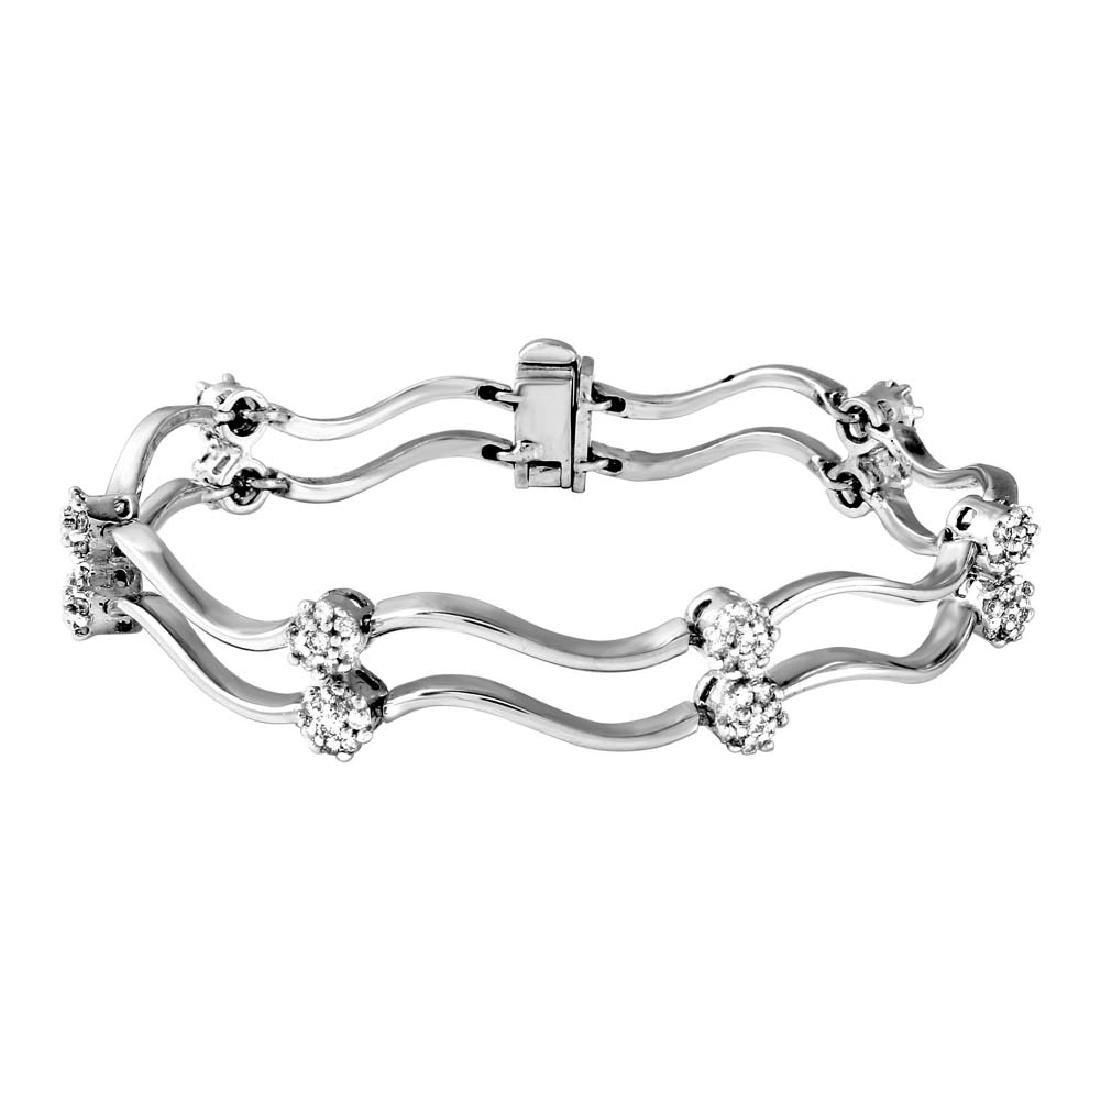 Genuine 1.88 TCW 18K White Gold Ladies Bracelet